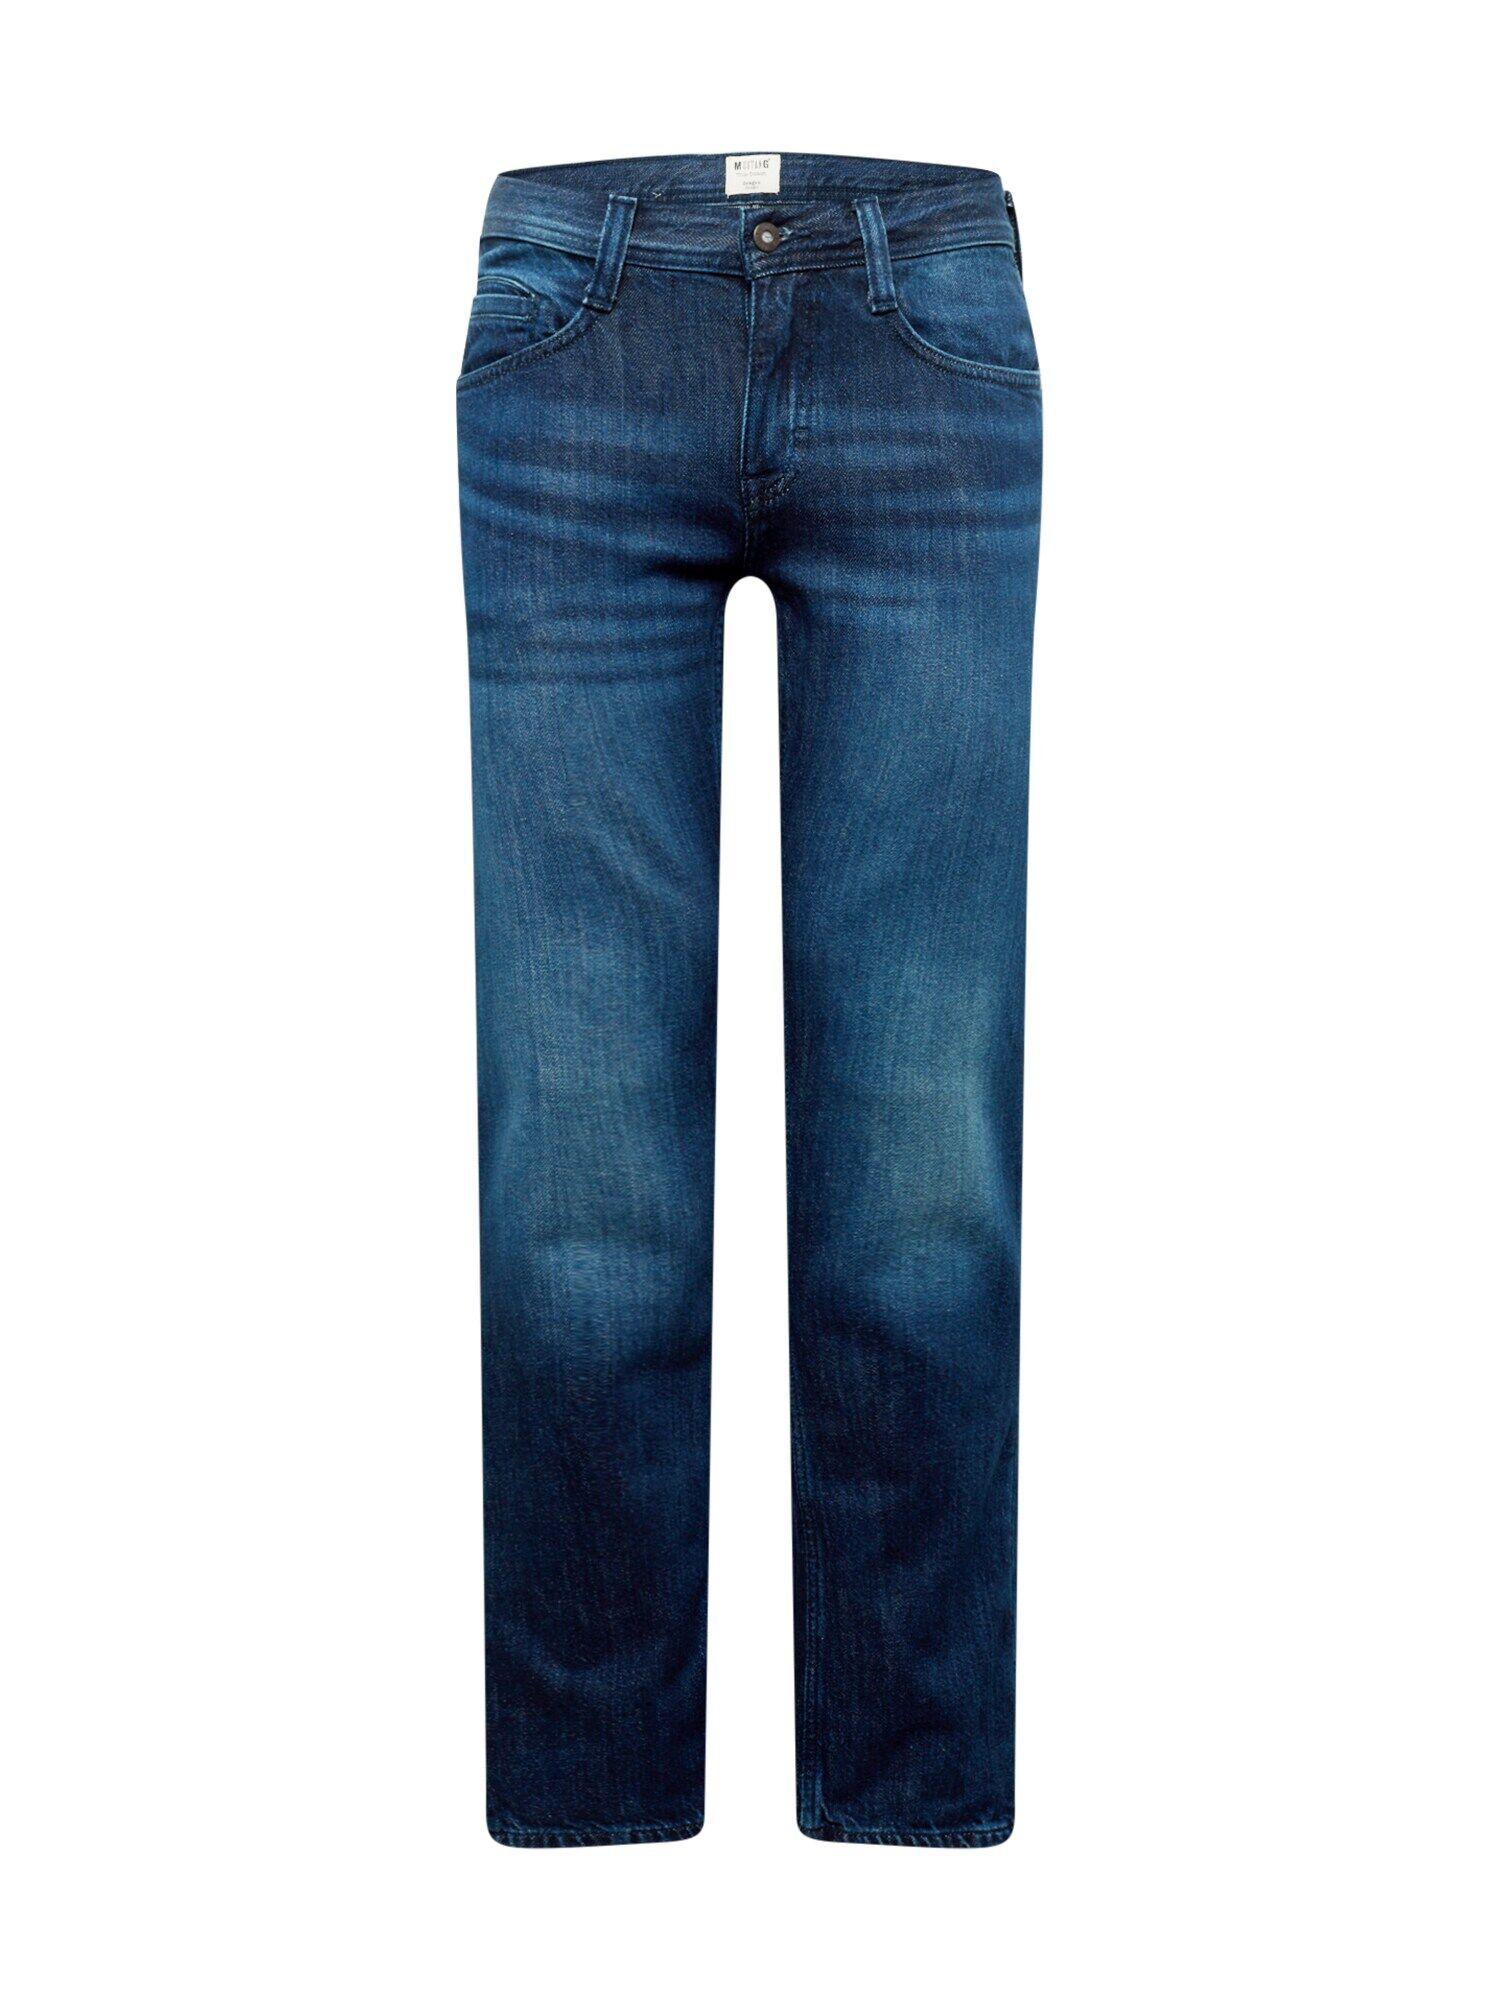 MUSTANG Jean 'Oregon'  - Bleu - Taille: 36 - male